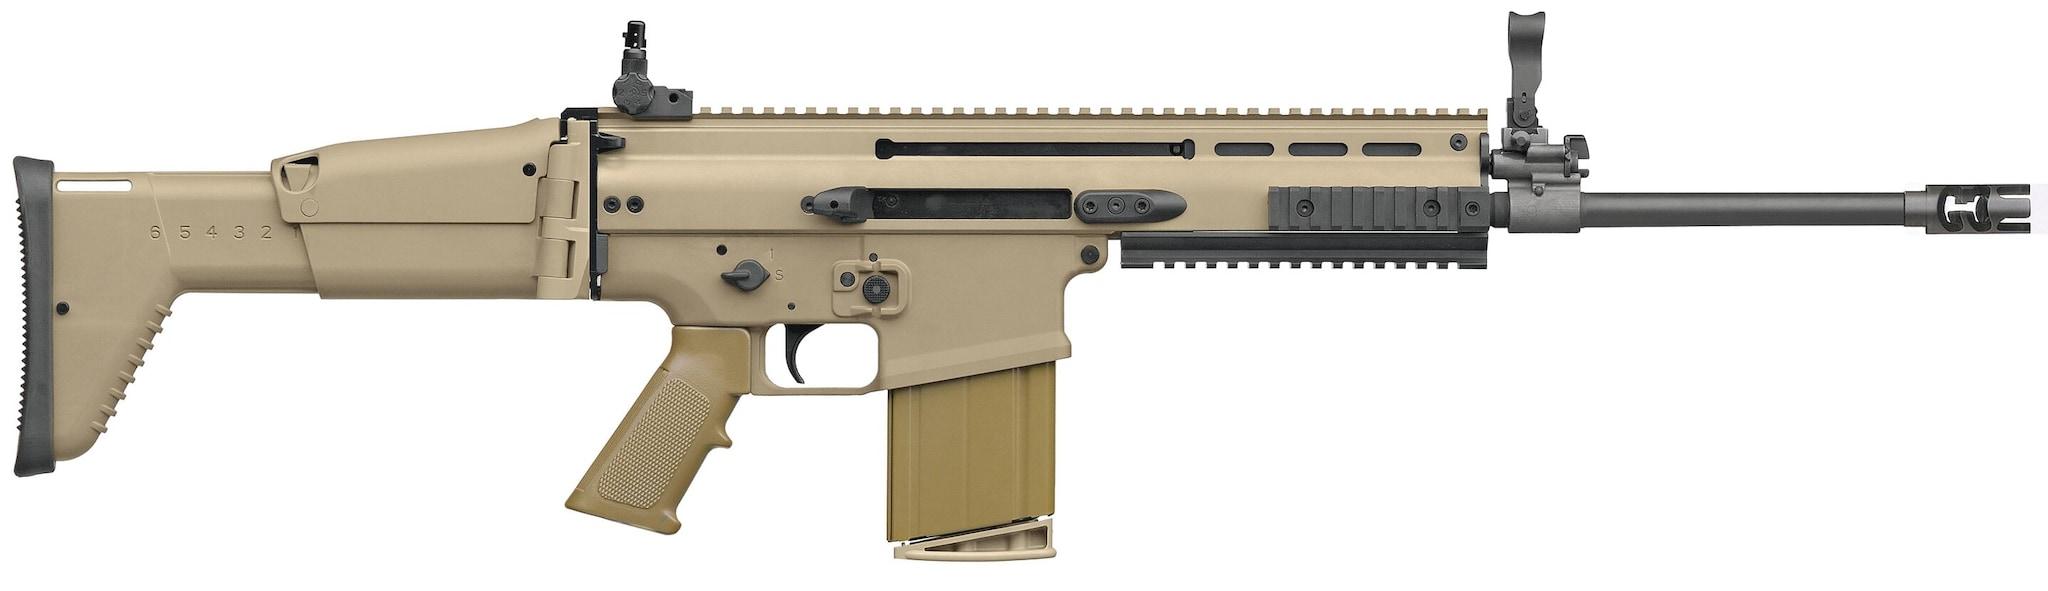 The FN SCAR 17S. (Photo: FN America)